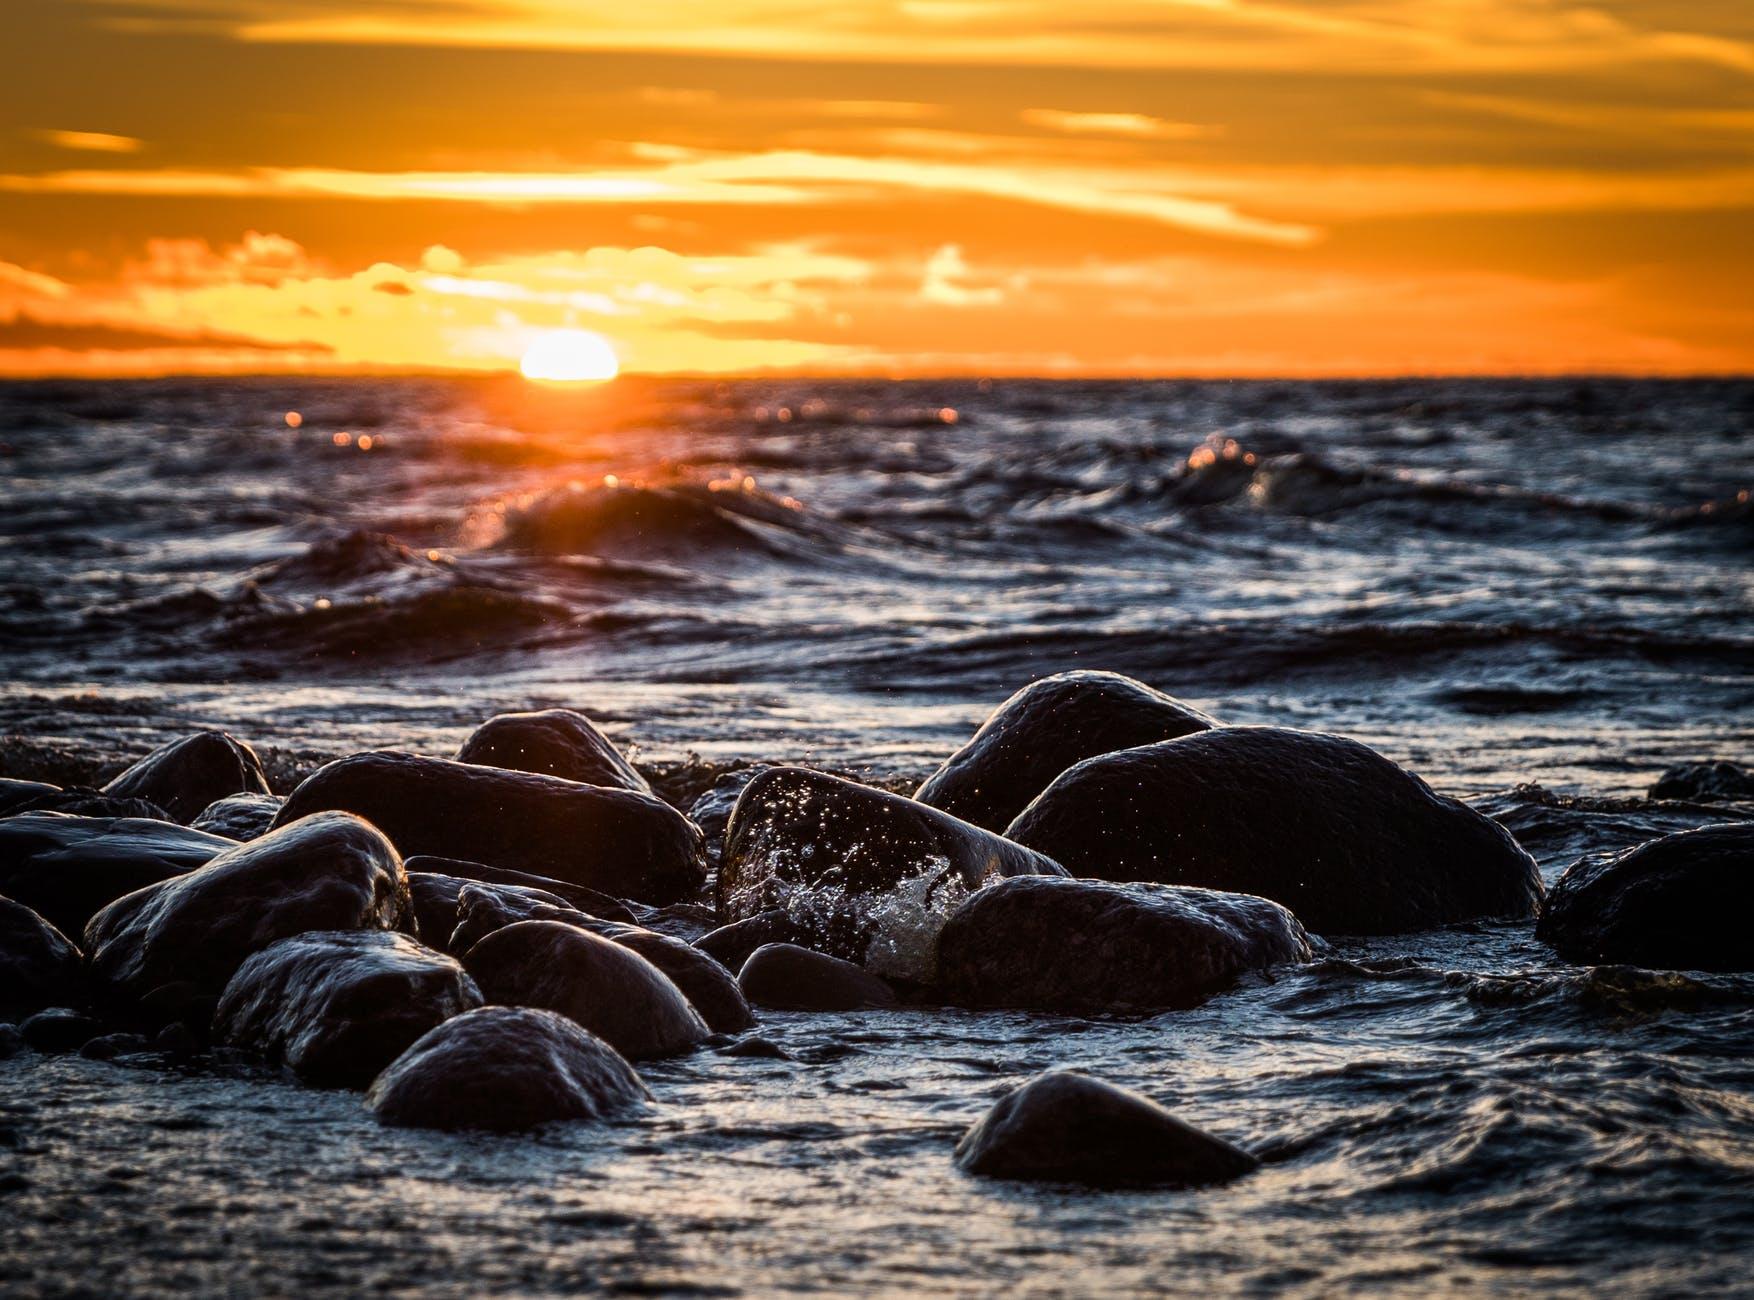 stones on beach during sunset